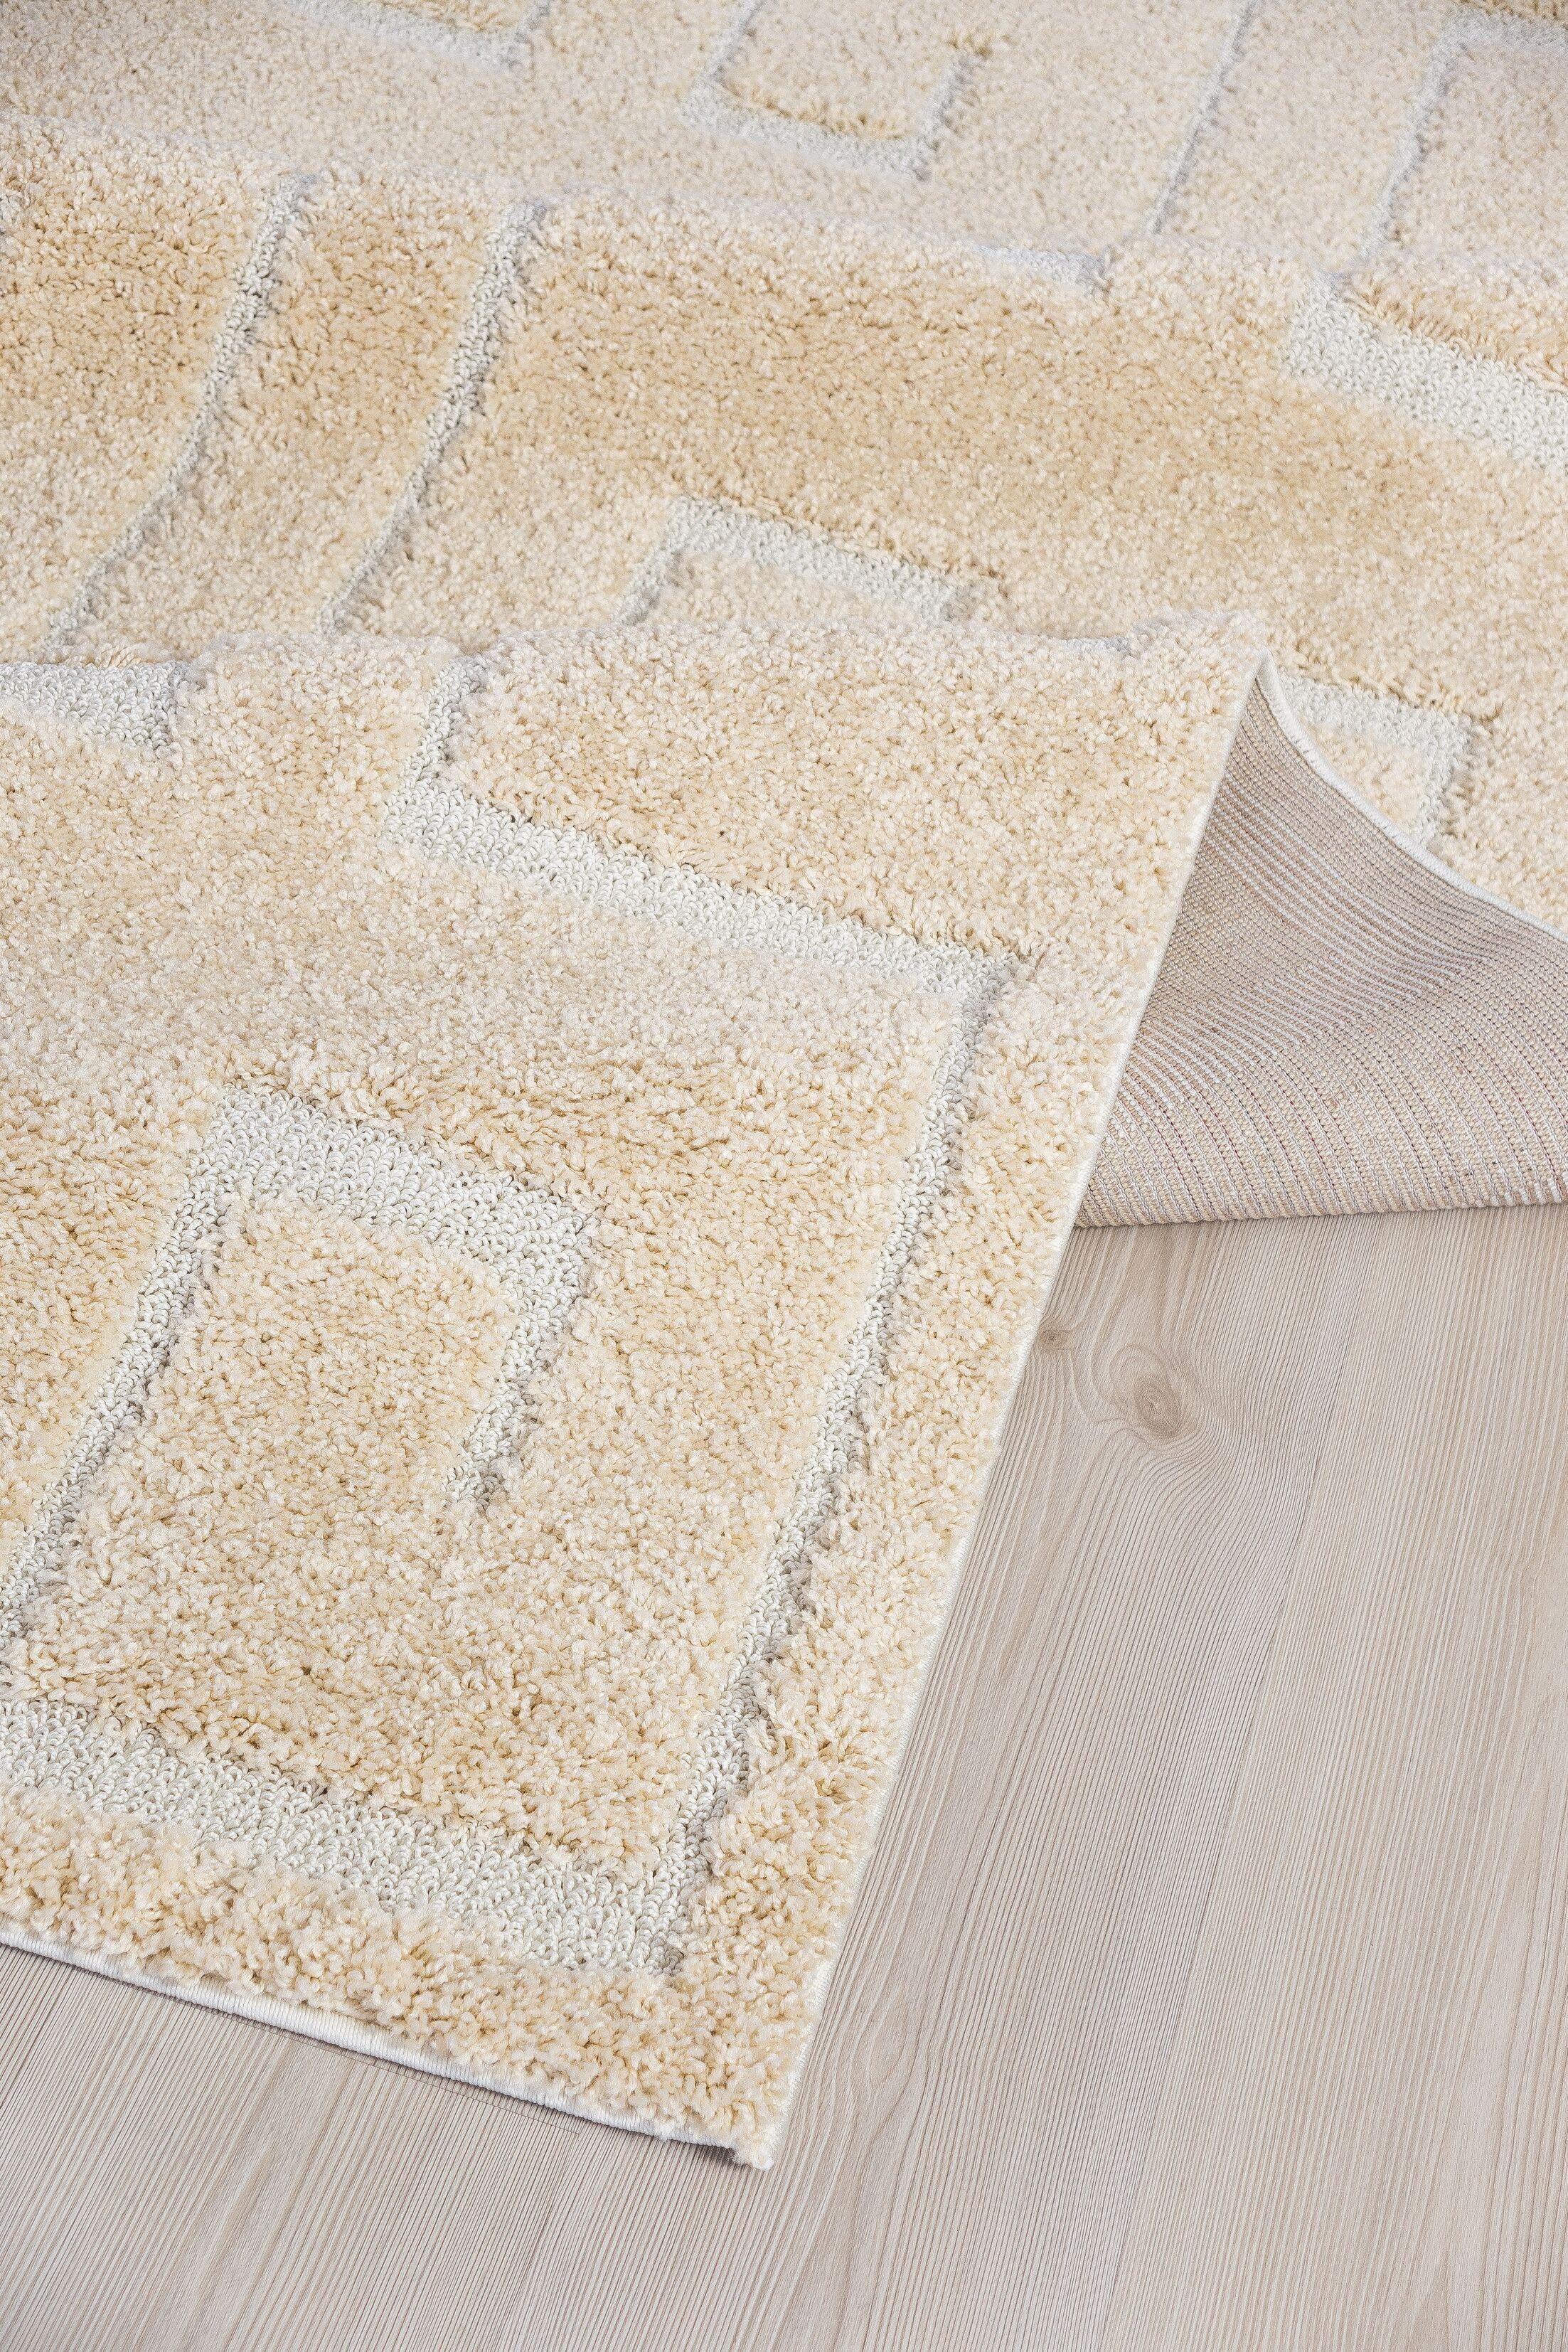 Artz Beige/White Area Rug Size: 8' x 10'